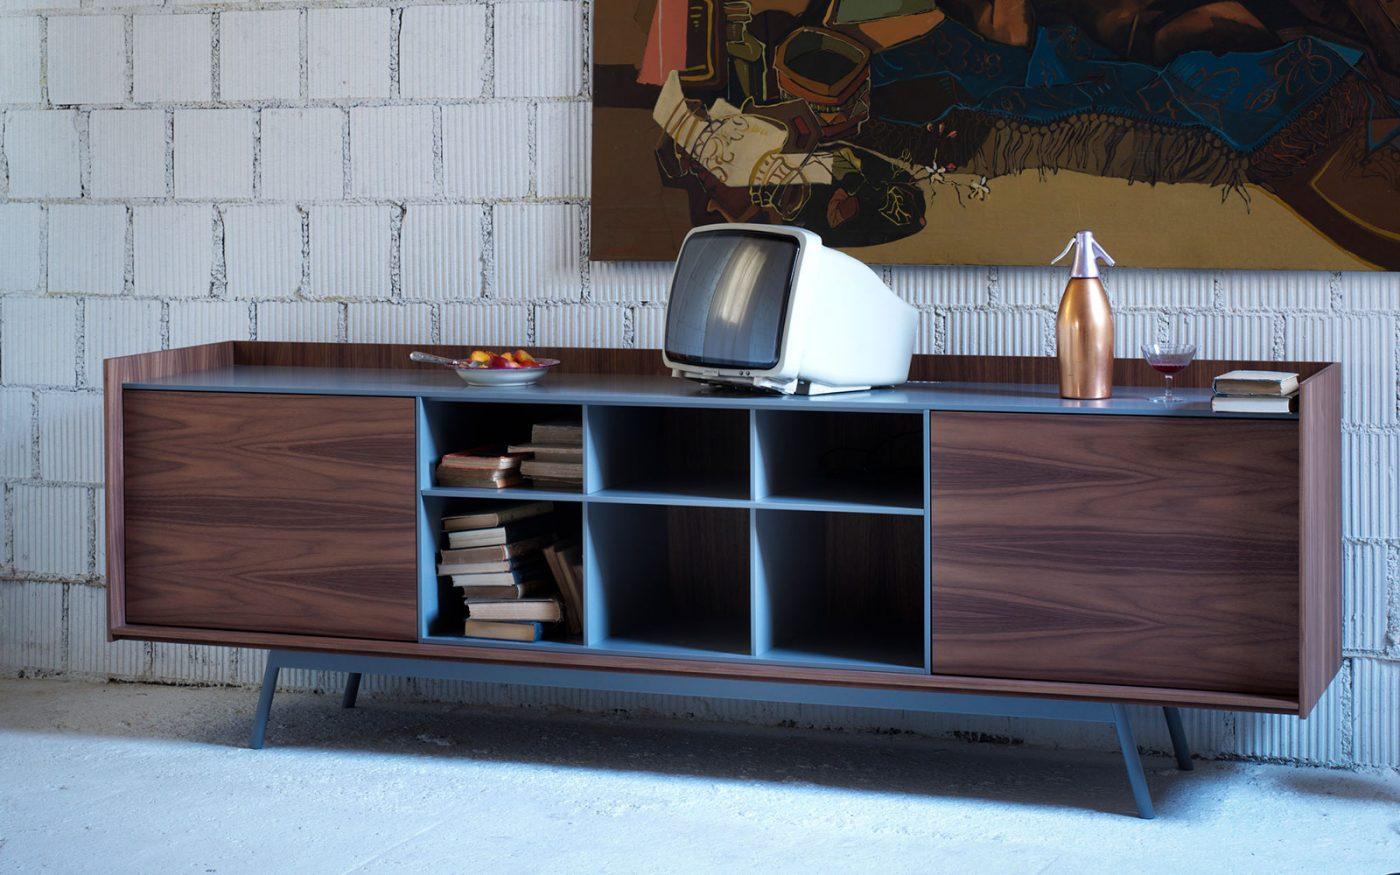 Edge-sideboard-miniforms-open-storage